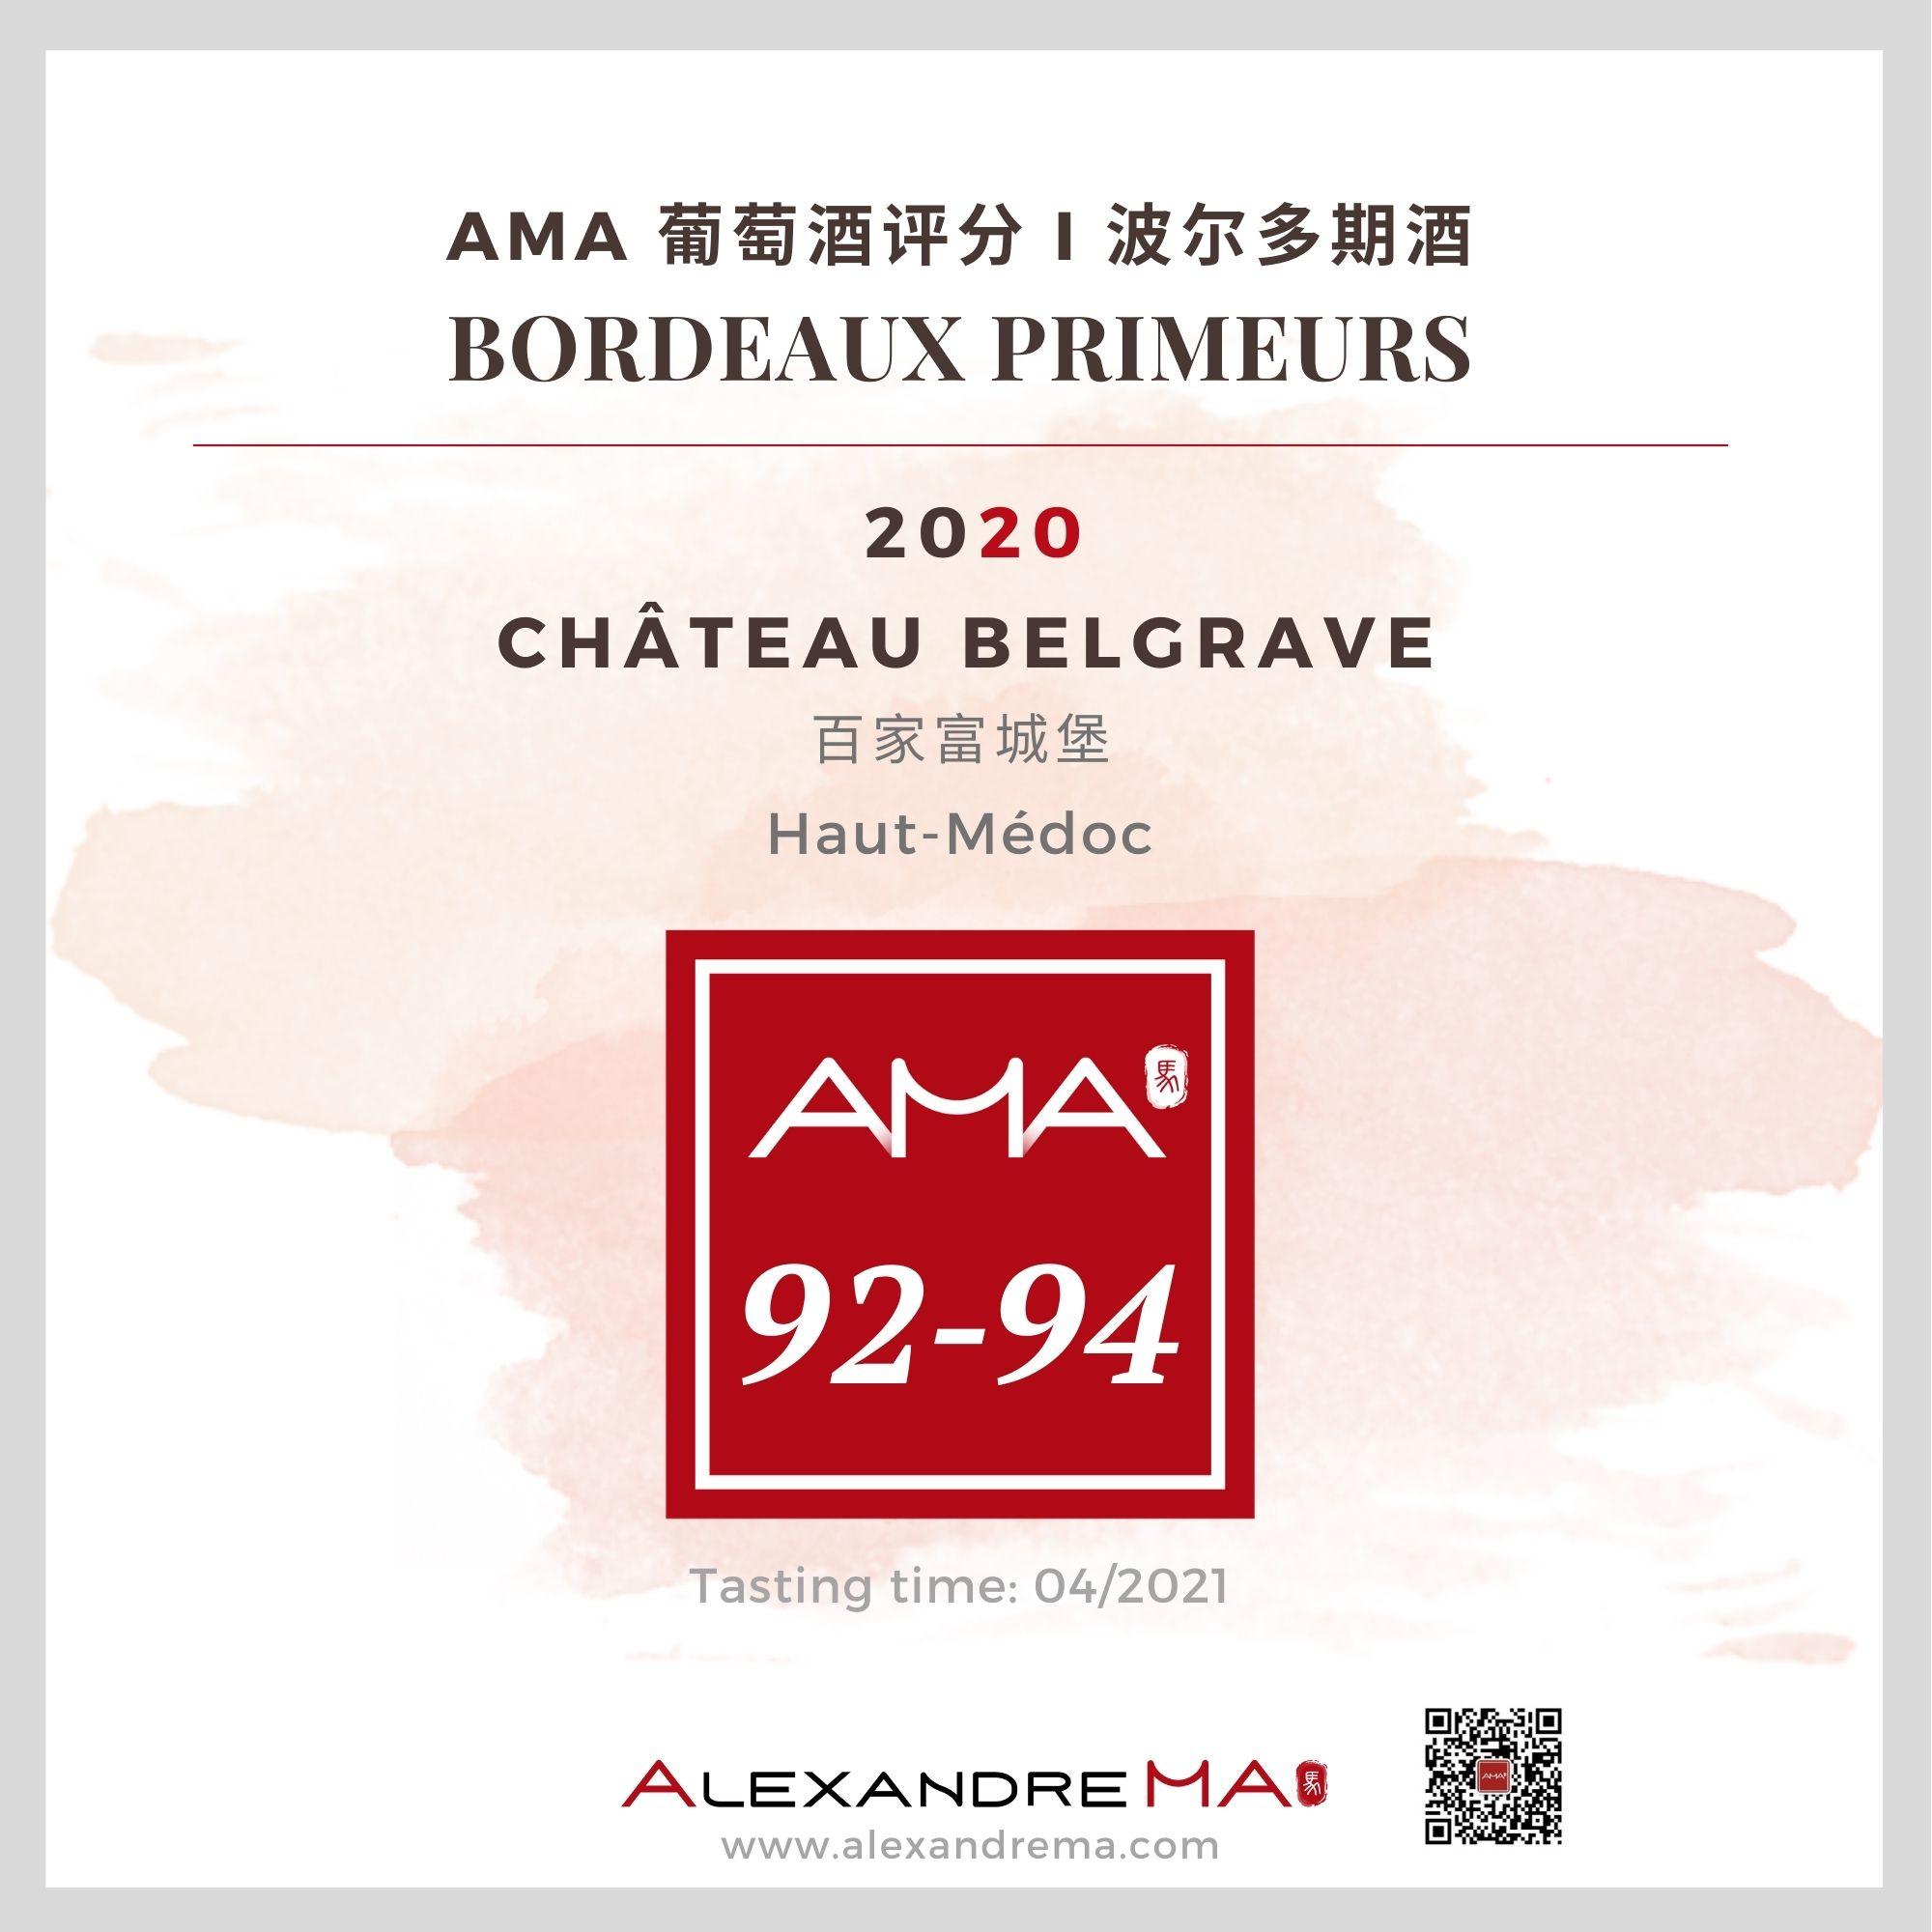 Château Belgrave 2020 百家富城堡 - Alexandre Ma